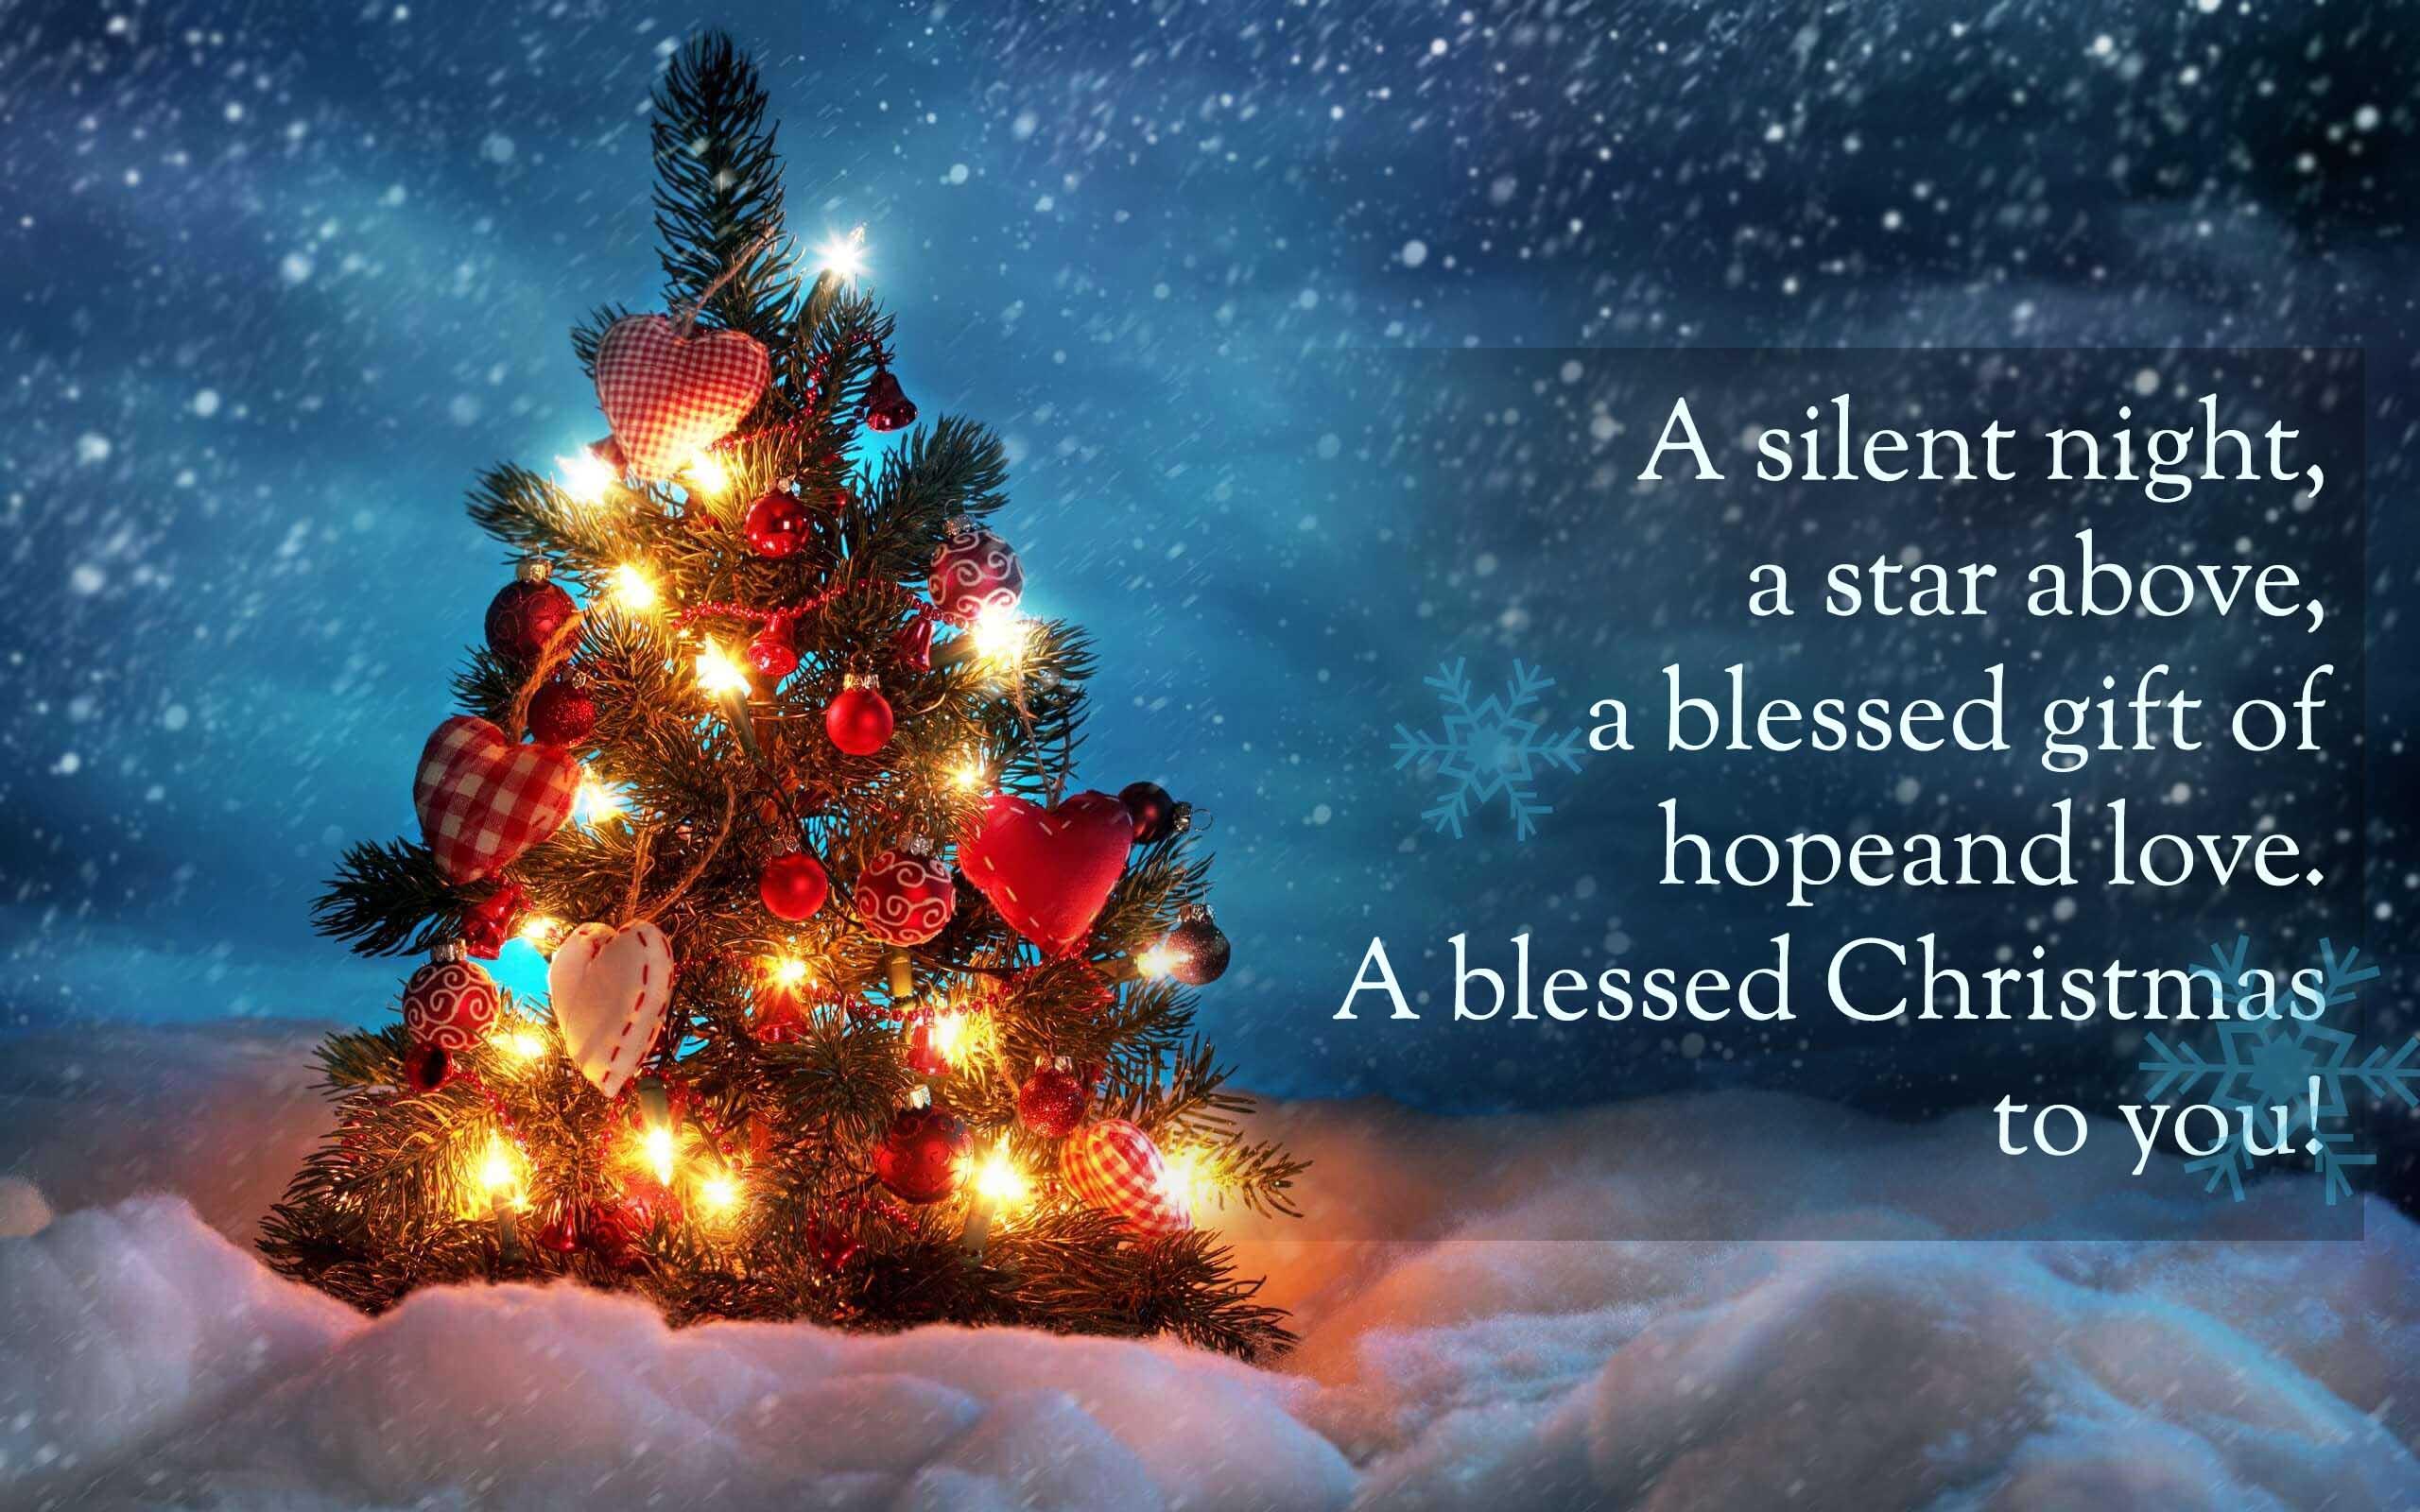 Merry Christmas 2020 Greetings